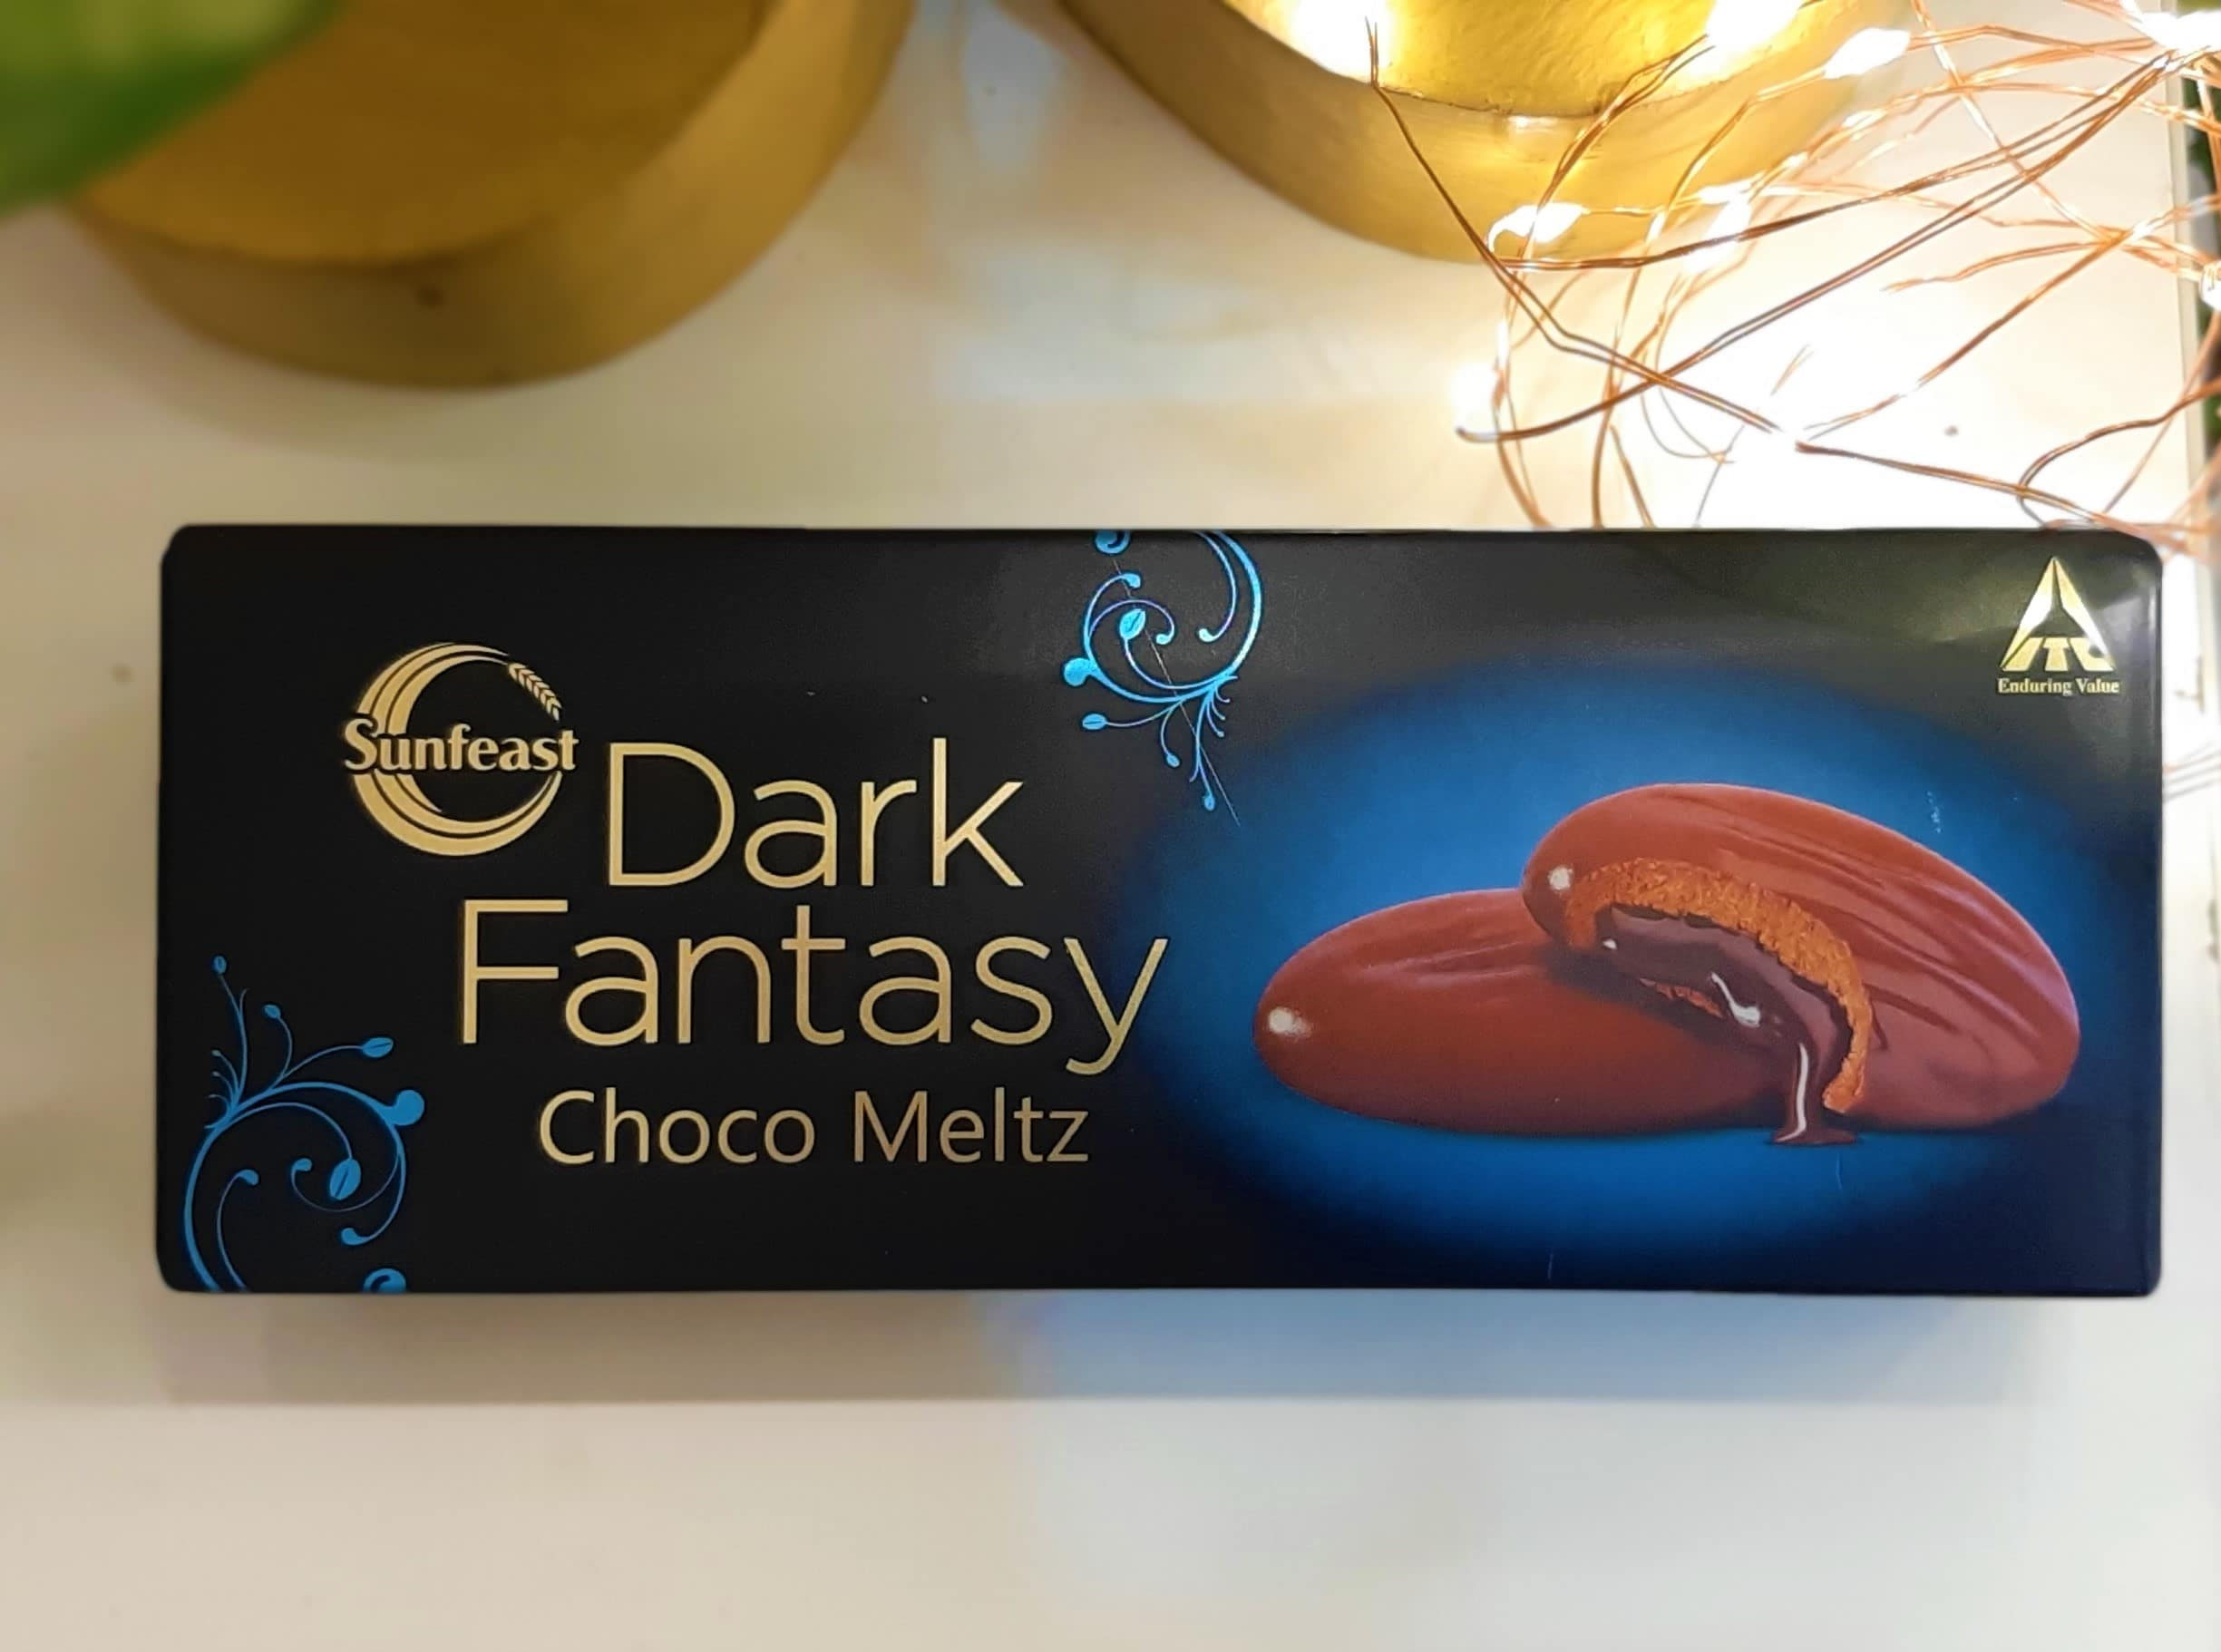 Sunfeast Dark Fantasy Choco Meltz: #FirstImpressions